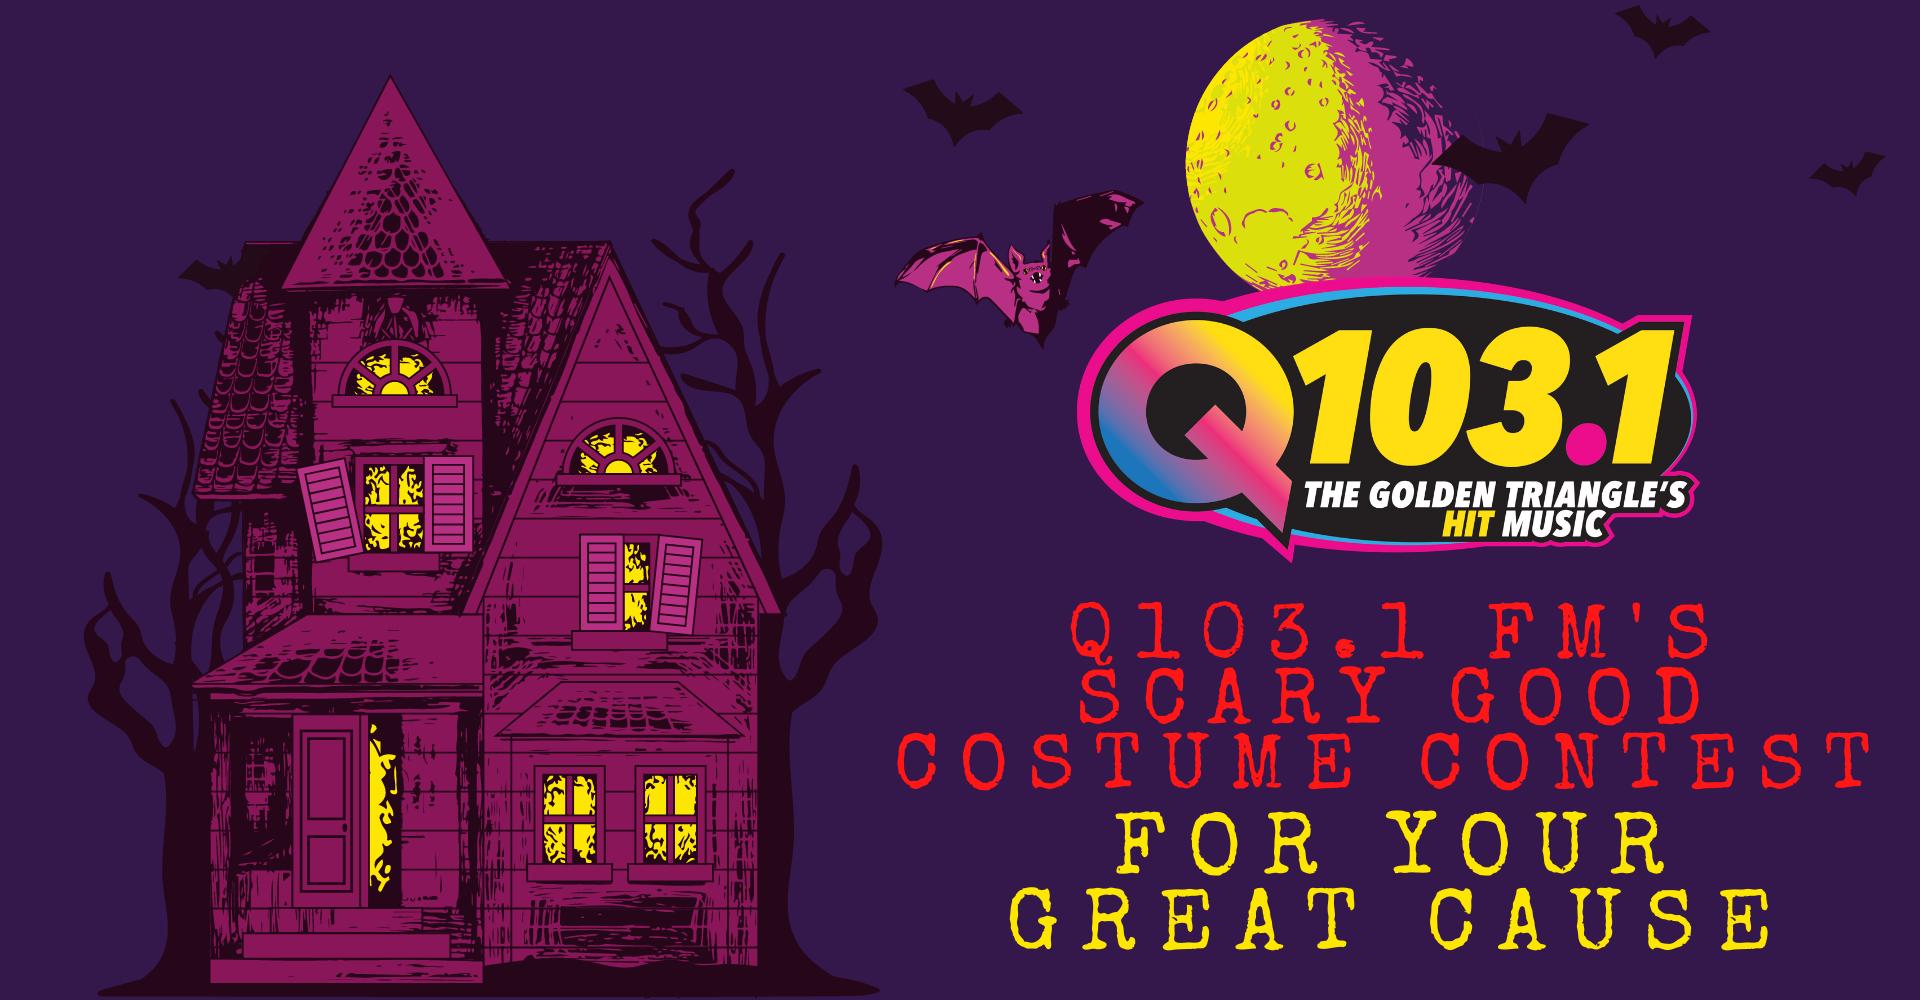 Q 103.1 FM's Scary Good Costume Contest